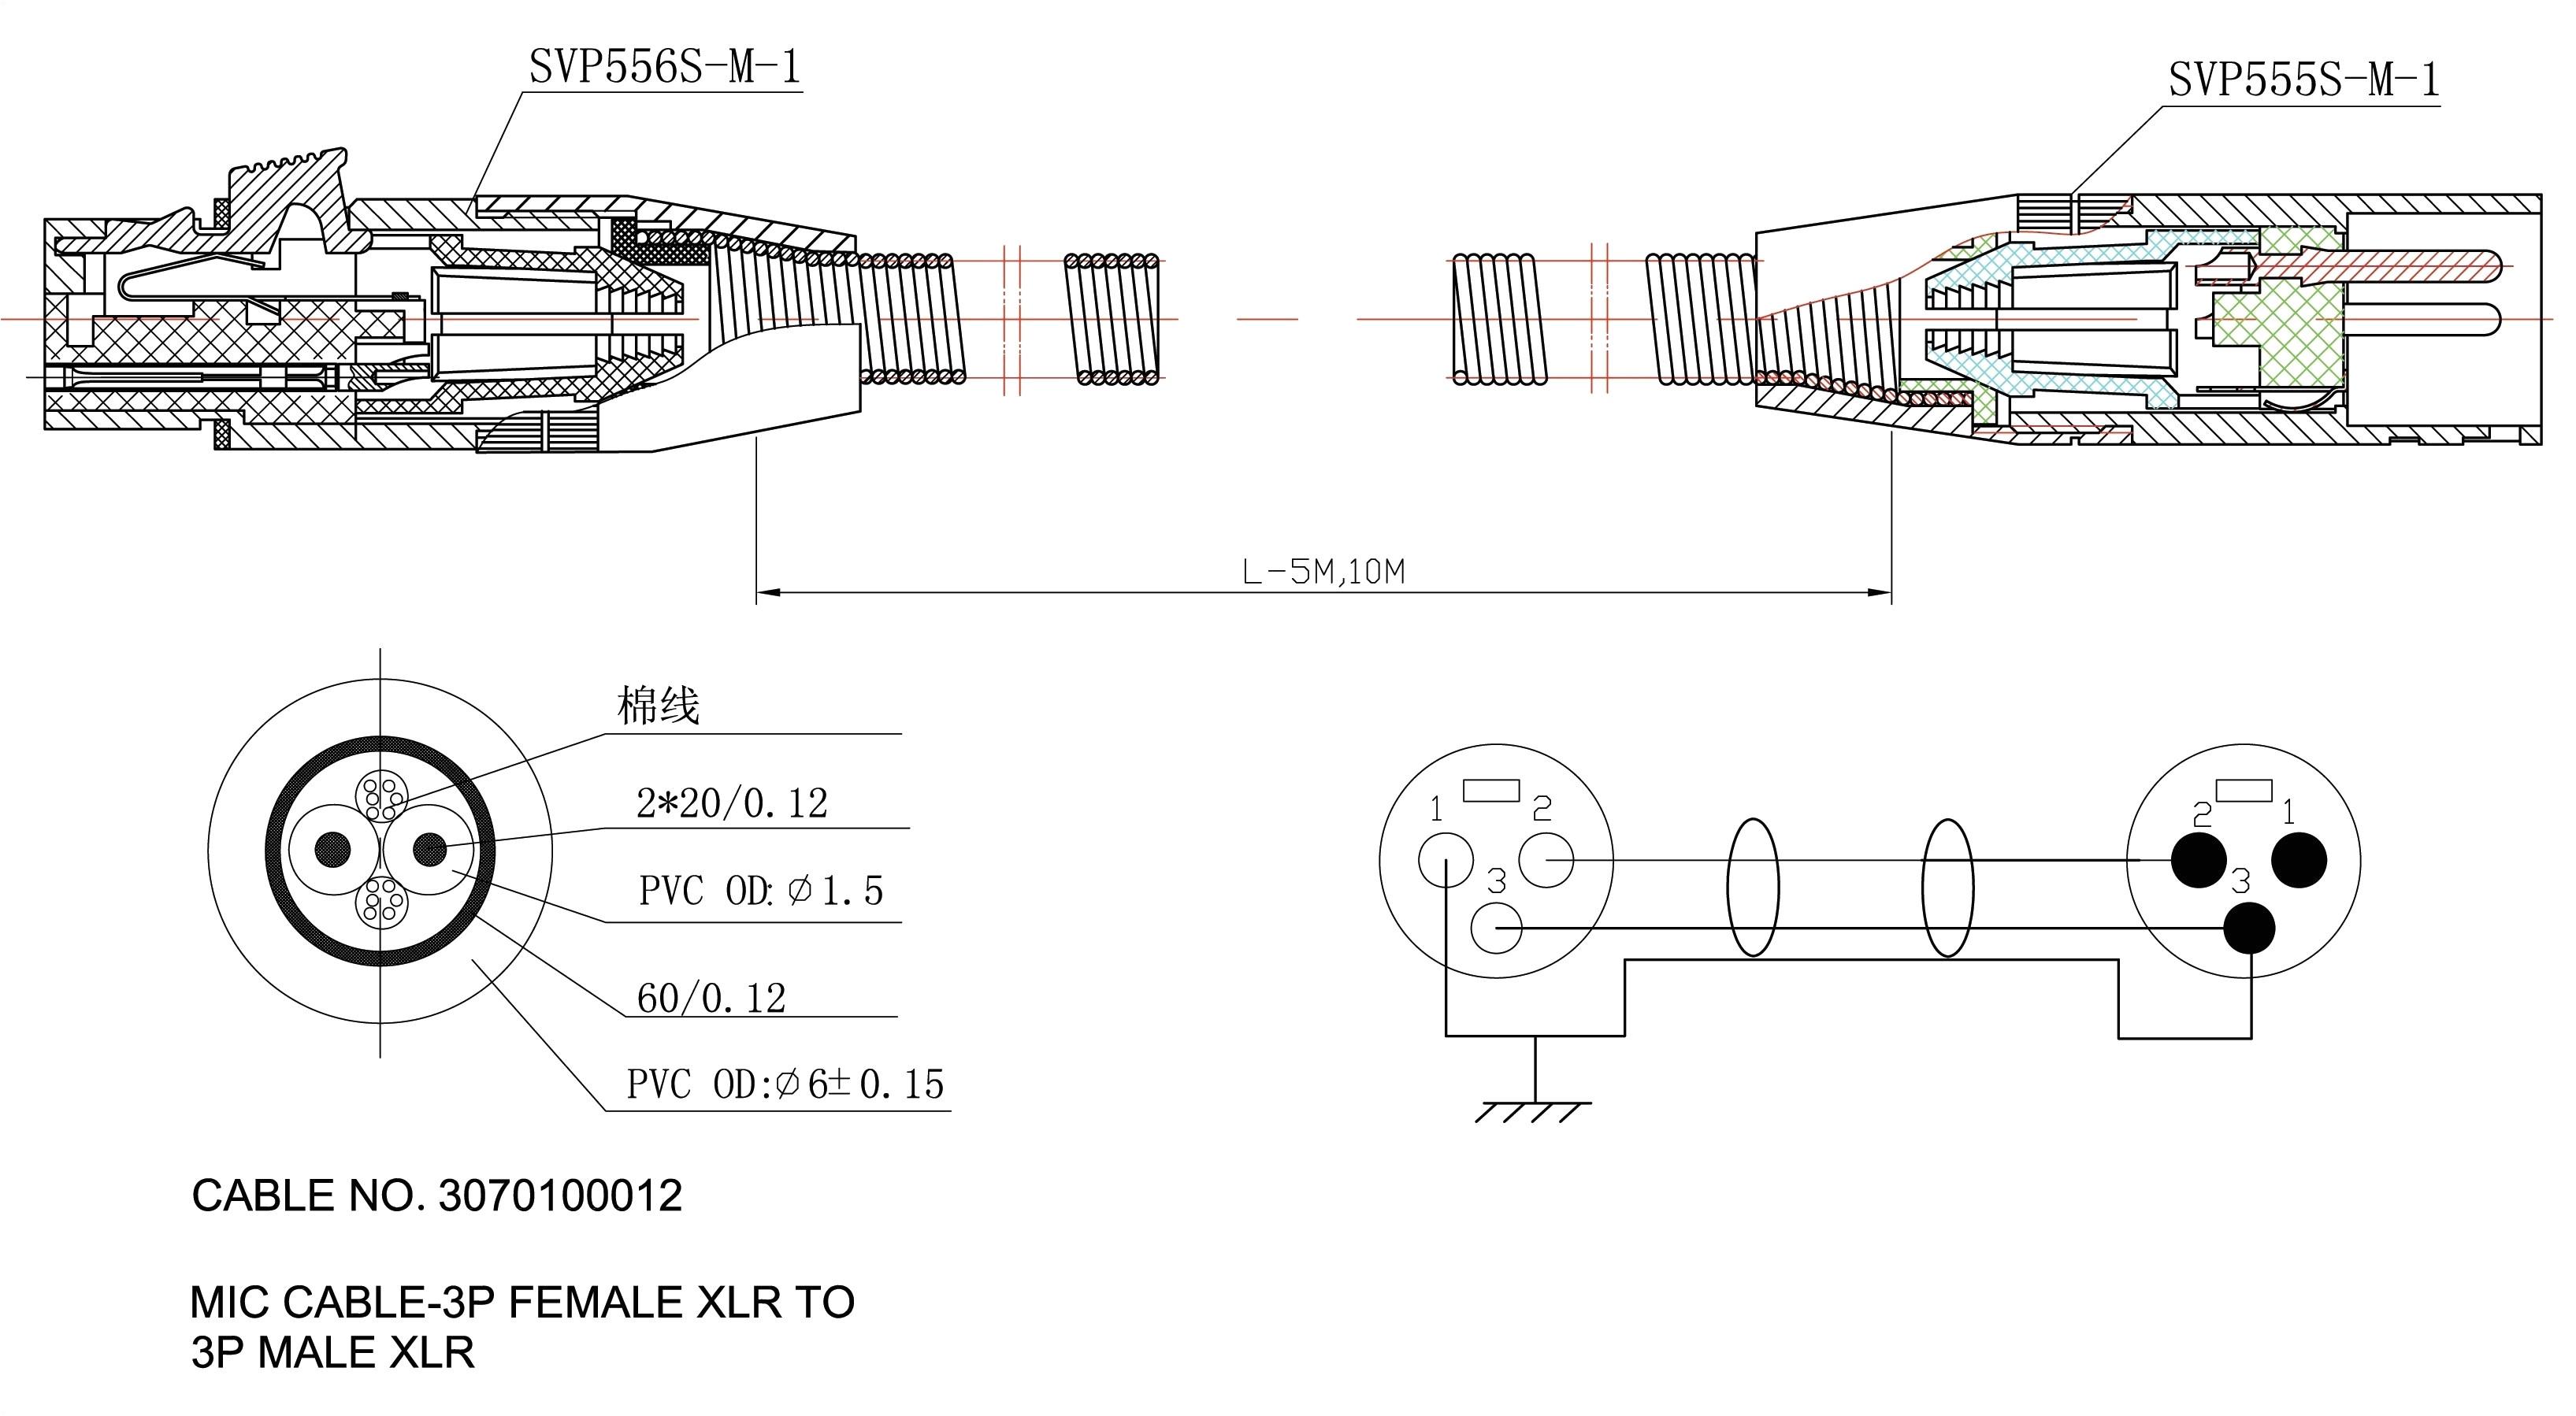 chrysler radio wiring diagrams best of 2004 jeep grand cherokee radio wiring diagram new 1996 grand